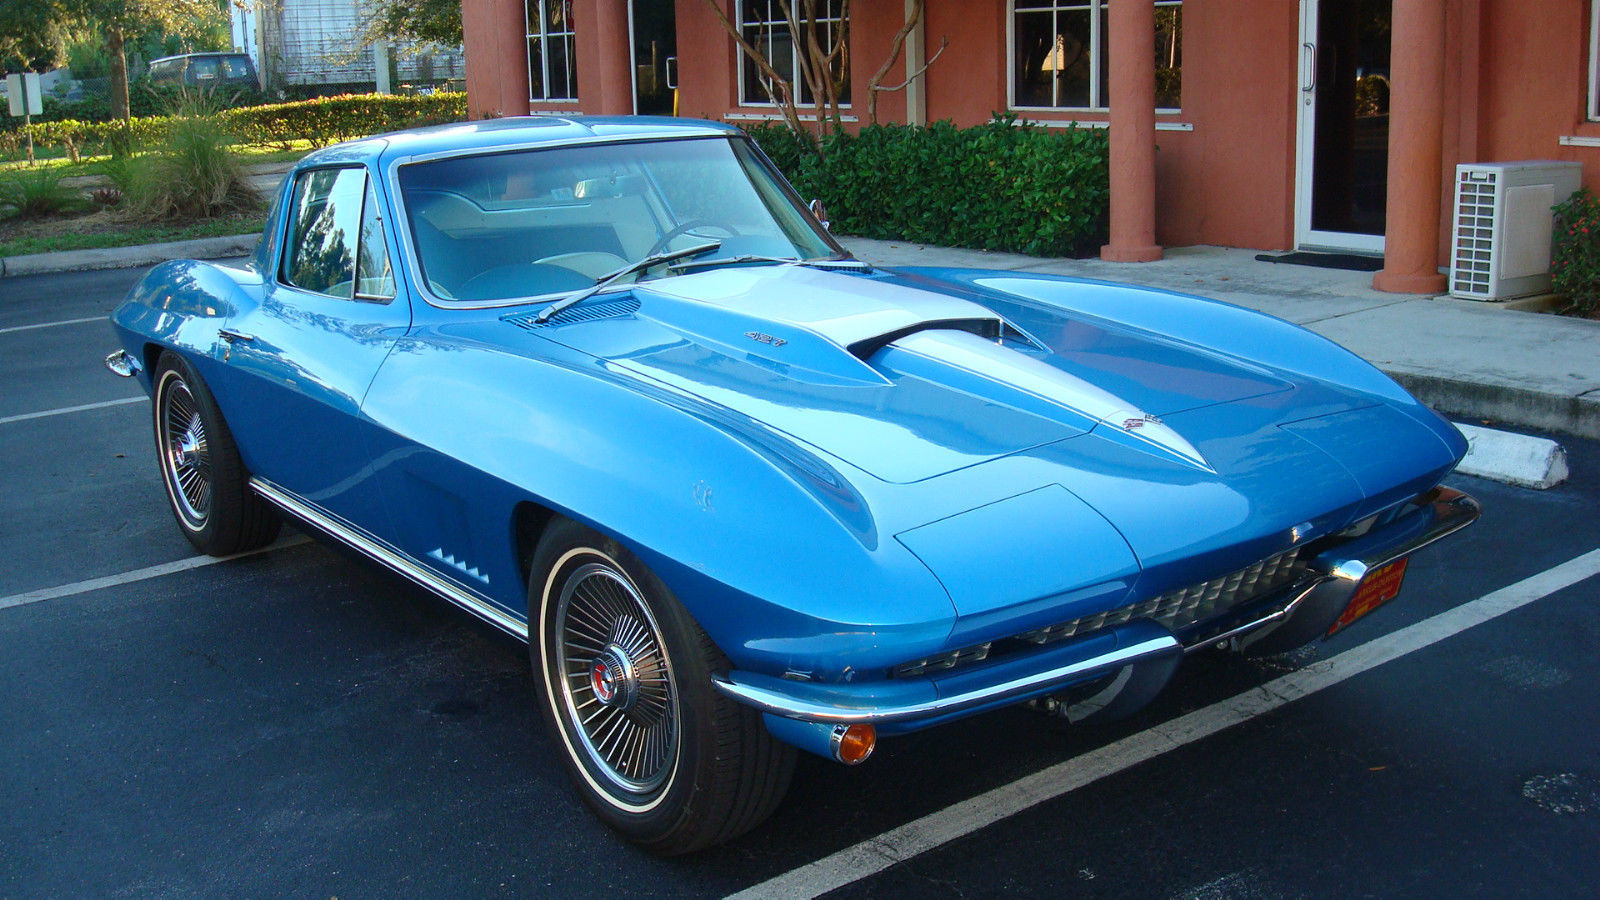 triple crown duntov winning 1967 corvette coupe. Black Bedroom Furniture Sets. Home Design Ideas